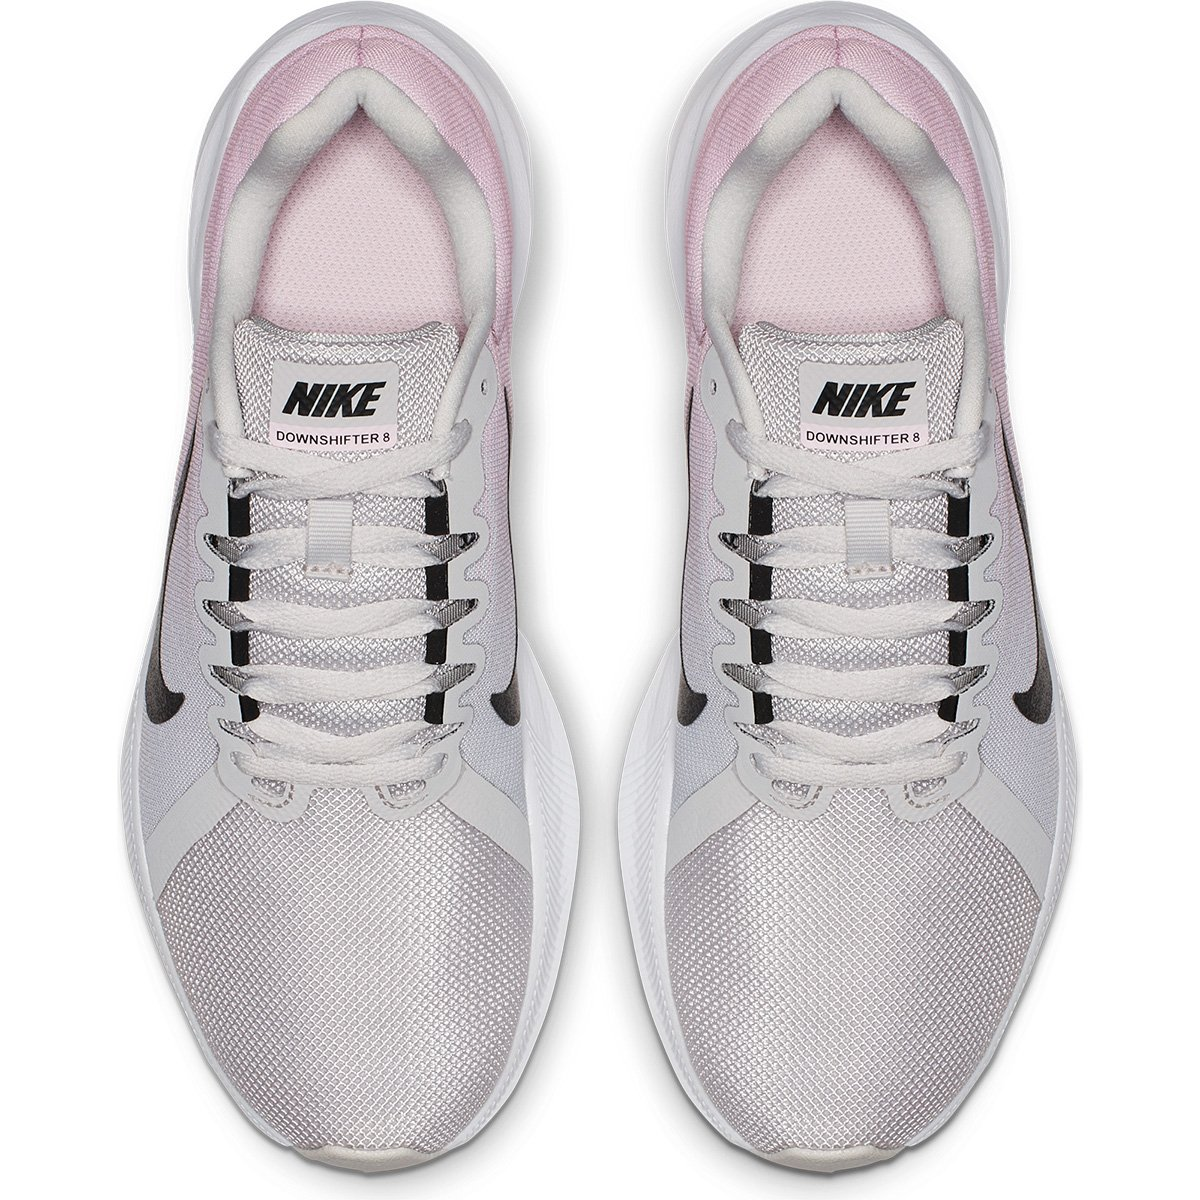 3a7b4643b0 Tênis Nike Wmns Downshifter 8 Feminino - Cinza - Compre Agora